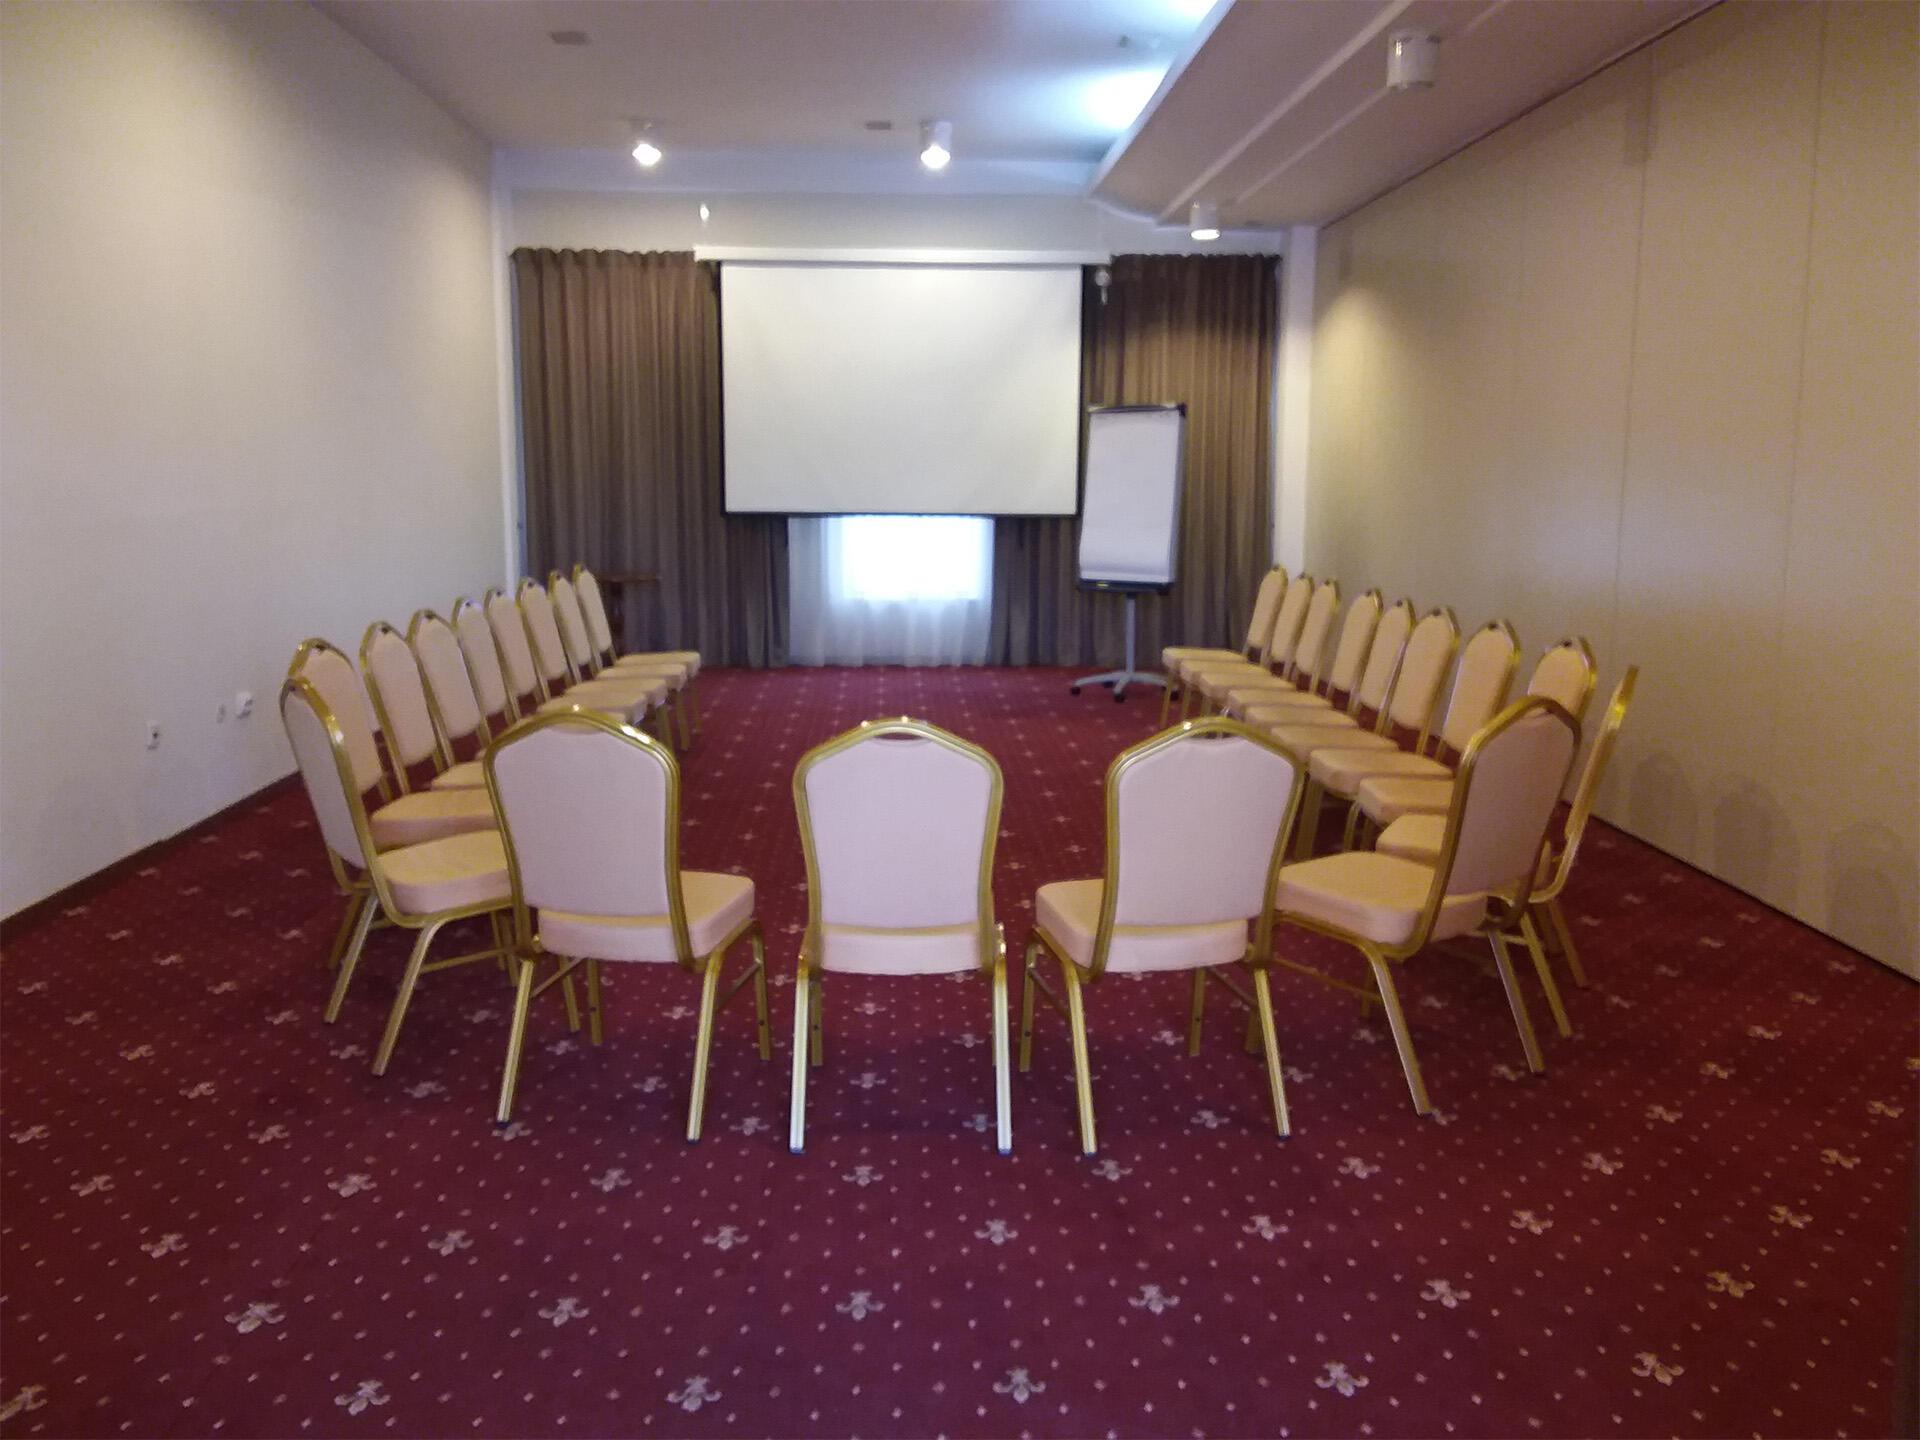 ROMA Room at IAKI Conference & Spa Hotel in Mamaia